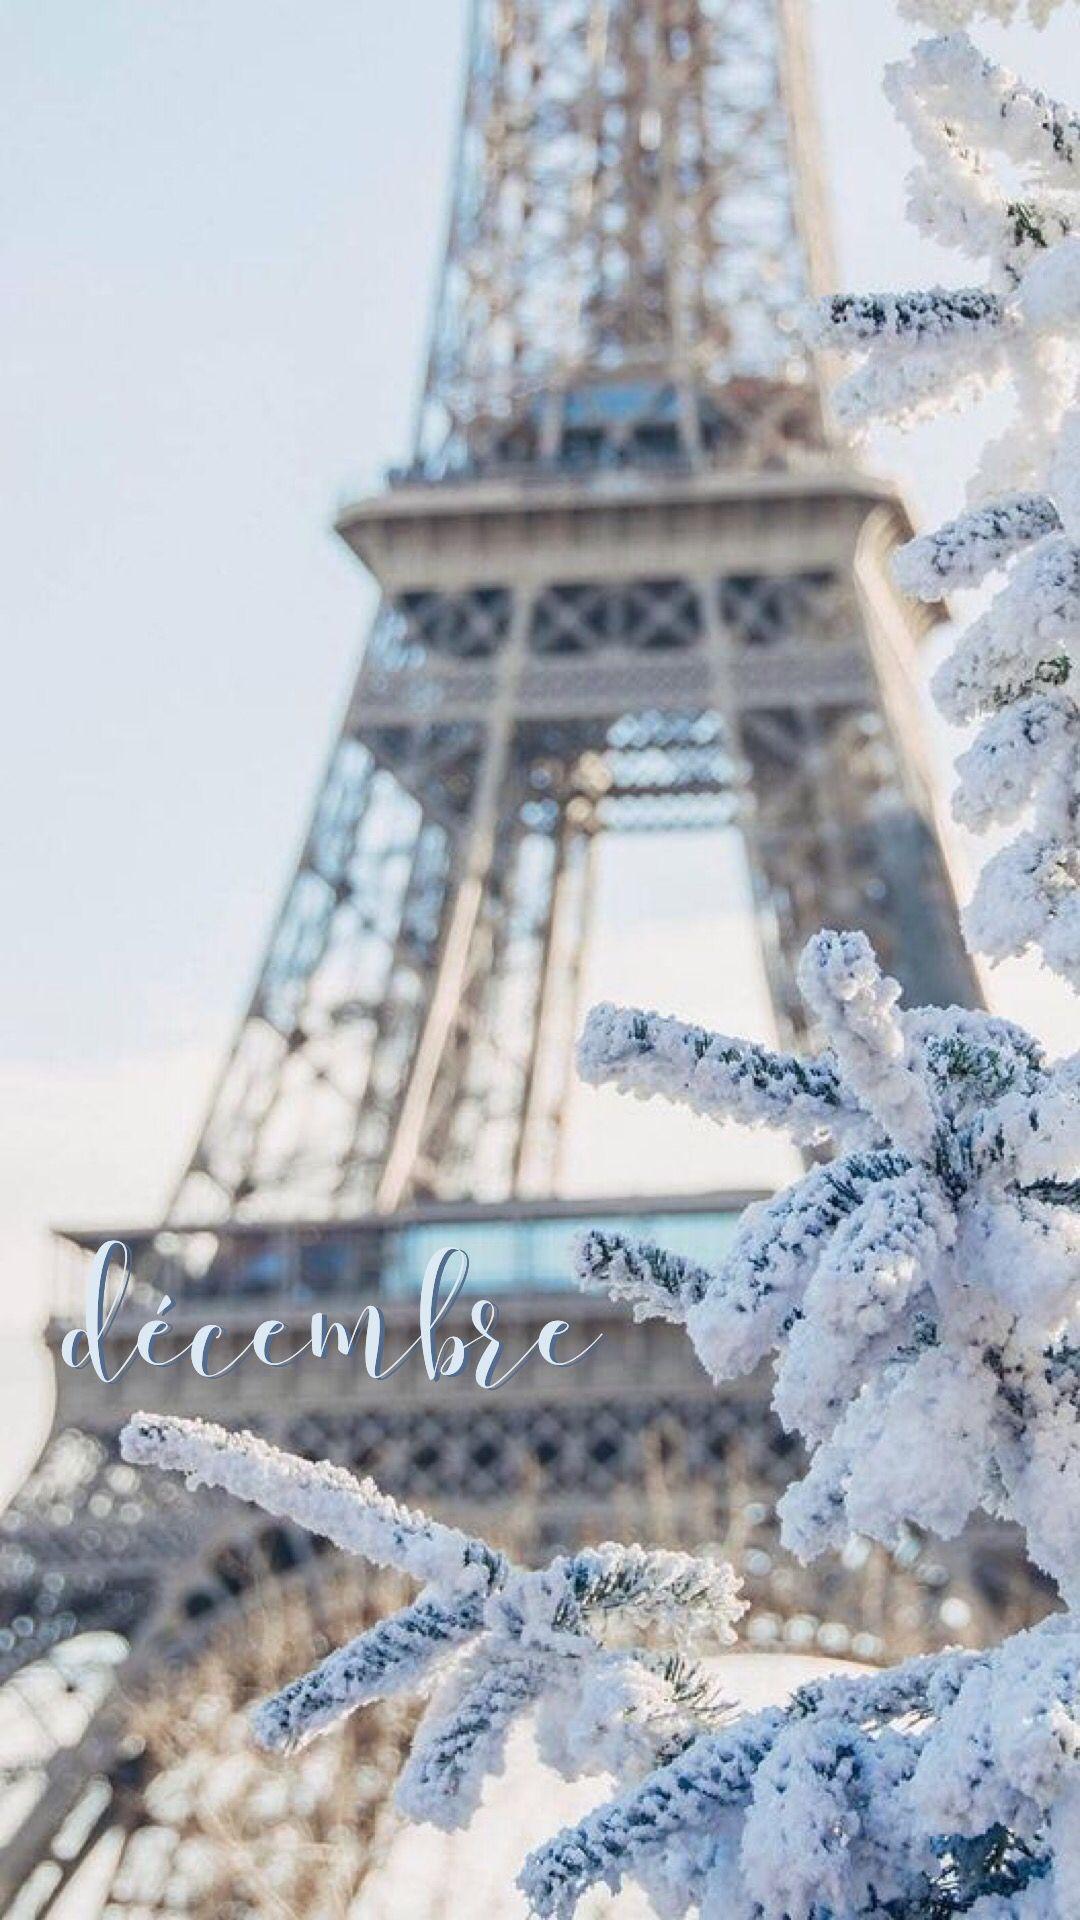 Decembre Paris Winter Toureiffel Parigi December Dicembre